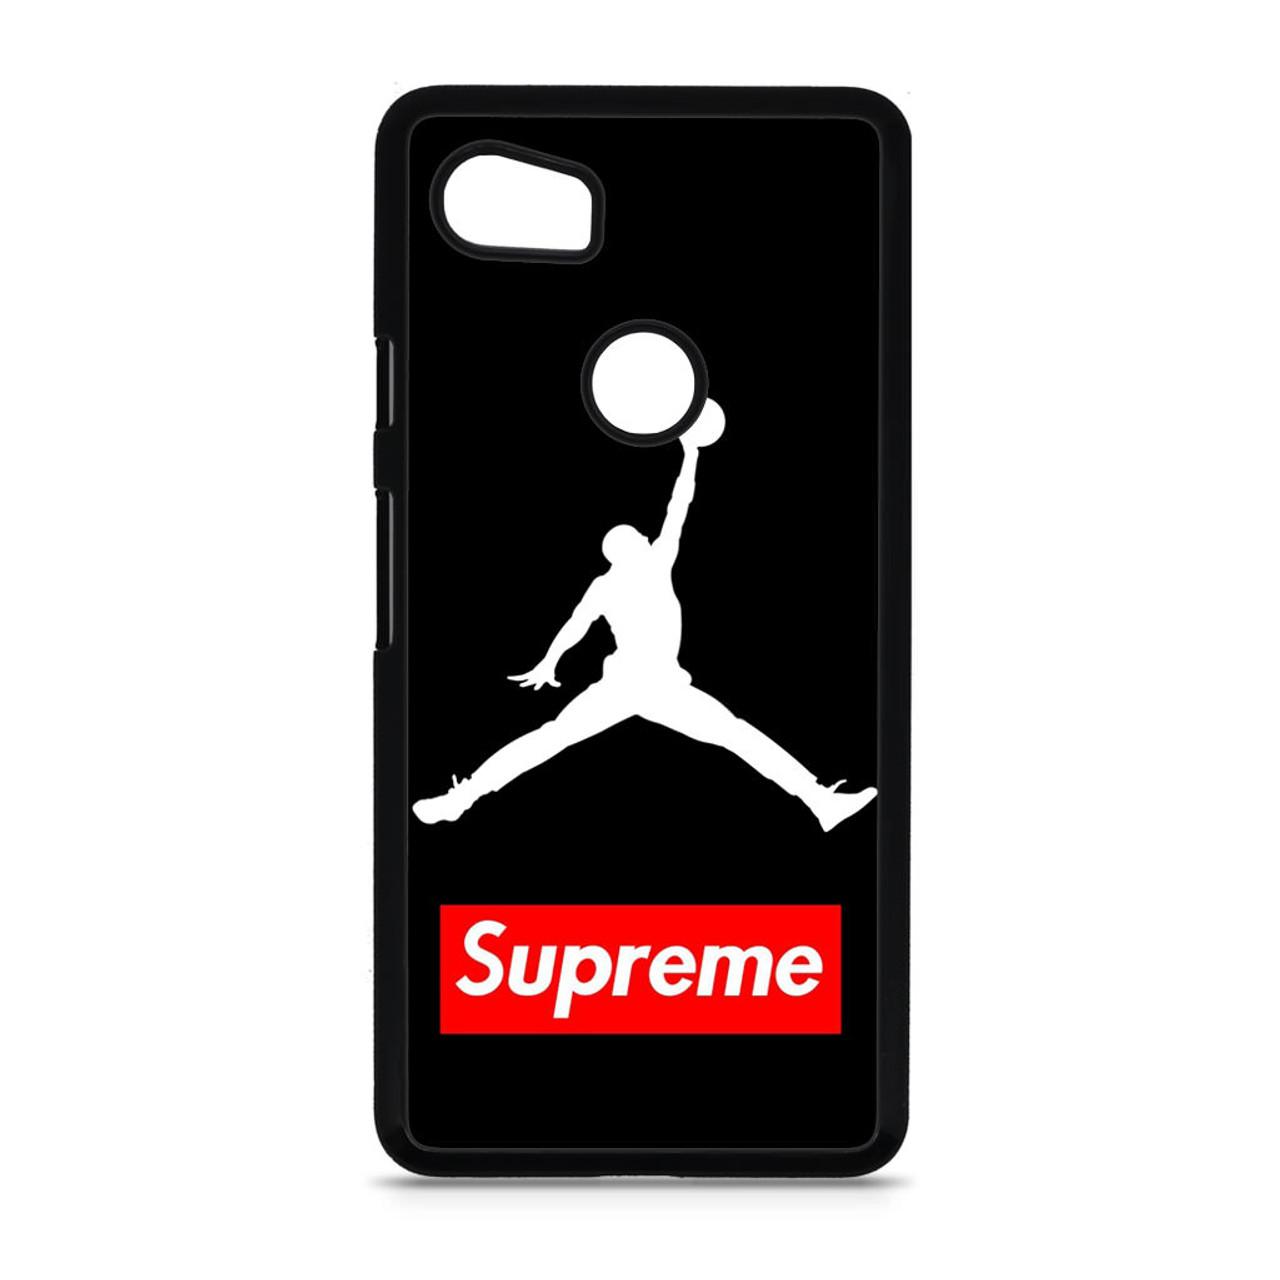 best loved 122cf 47624 Supreme Air Jordan Google Pixel 2 XL Case